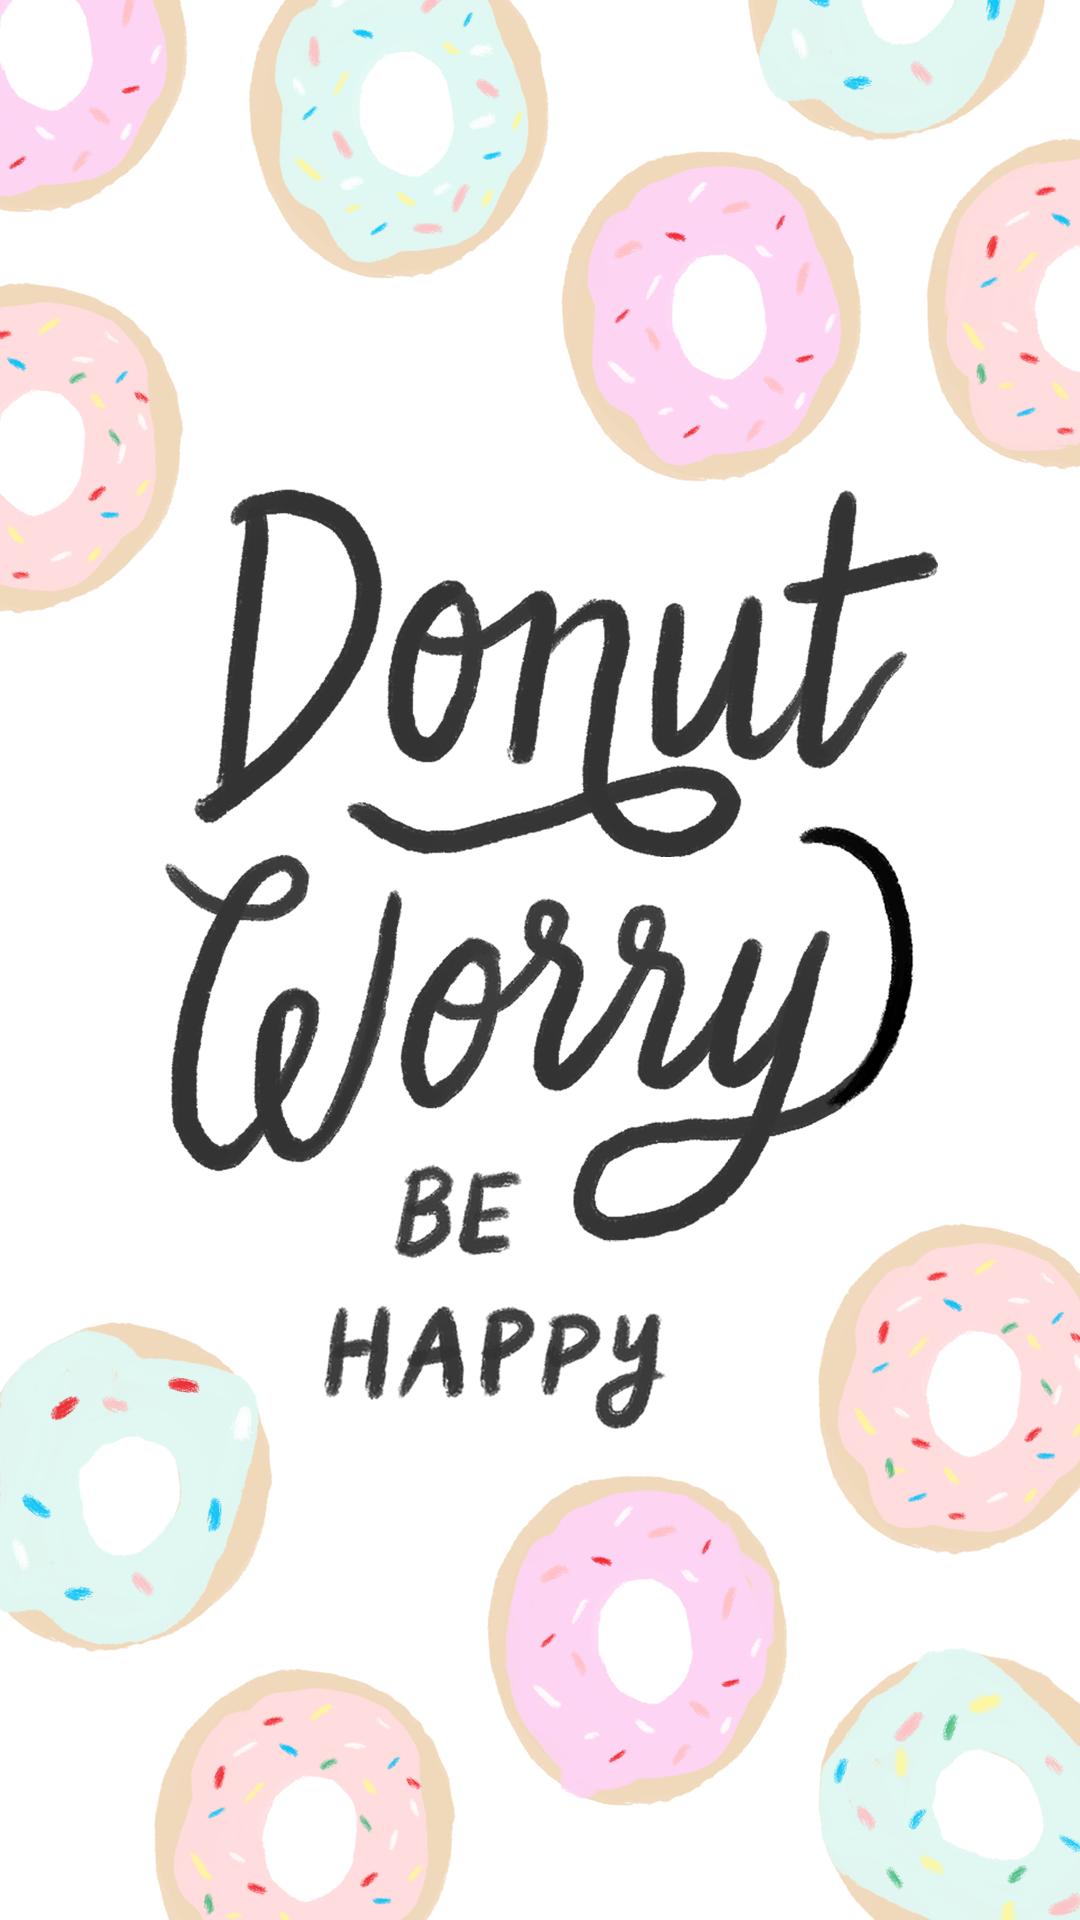 iphone-donut-worry-×-pixels-wallpaper-wpc5806401